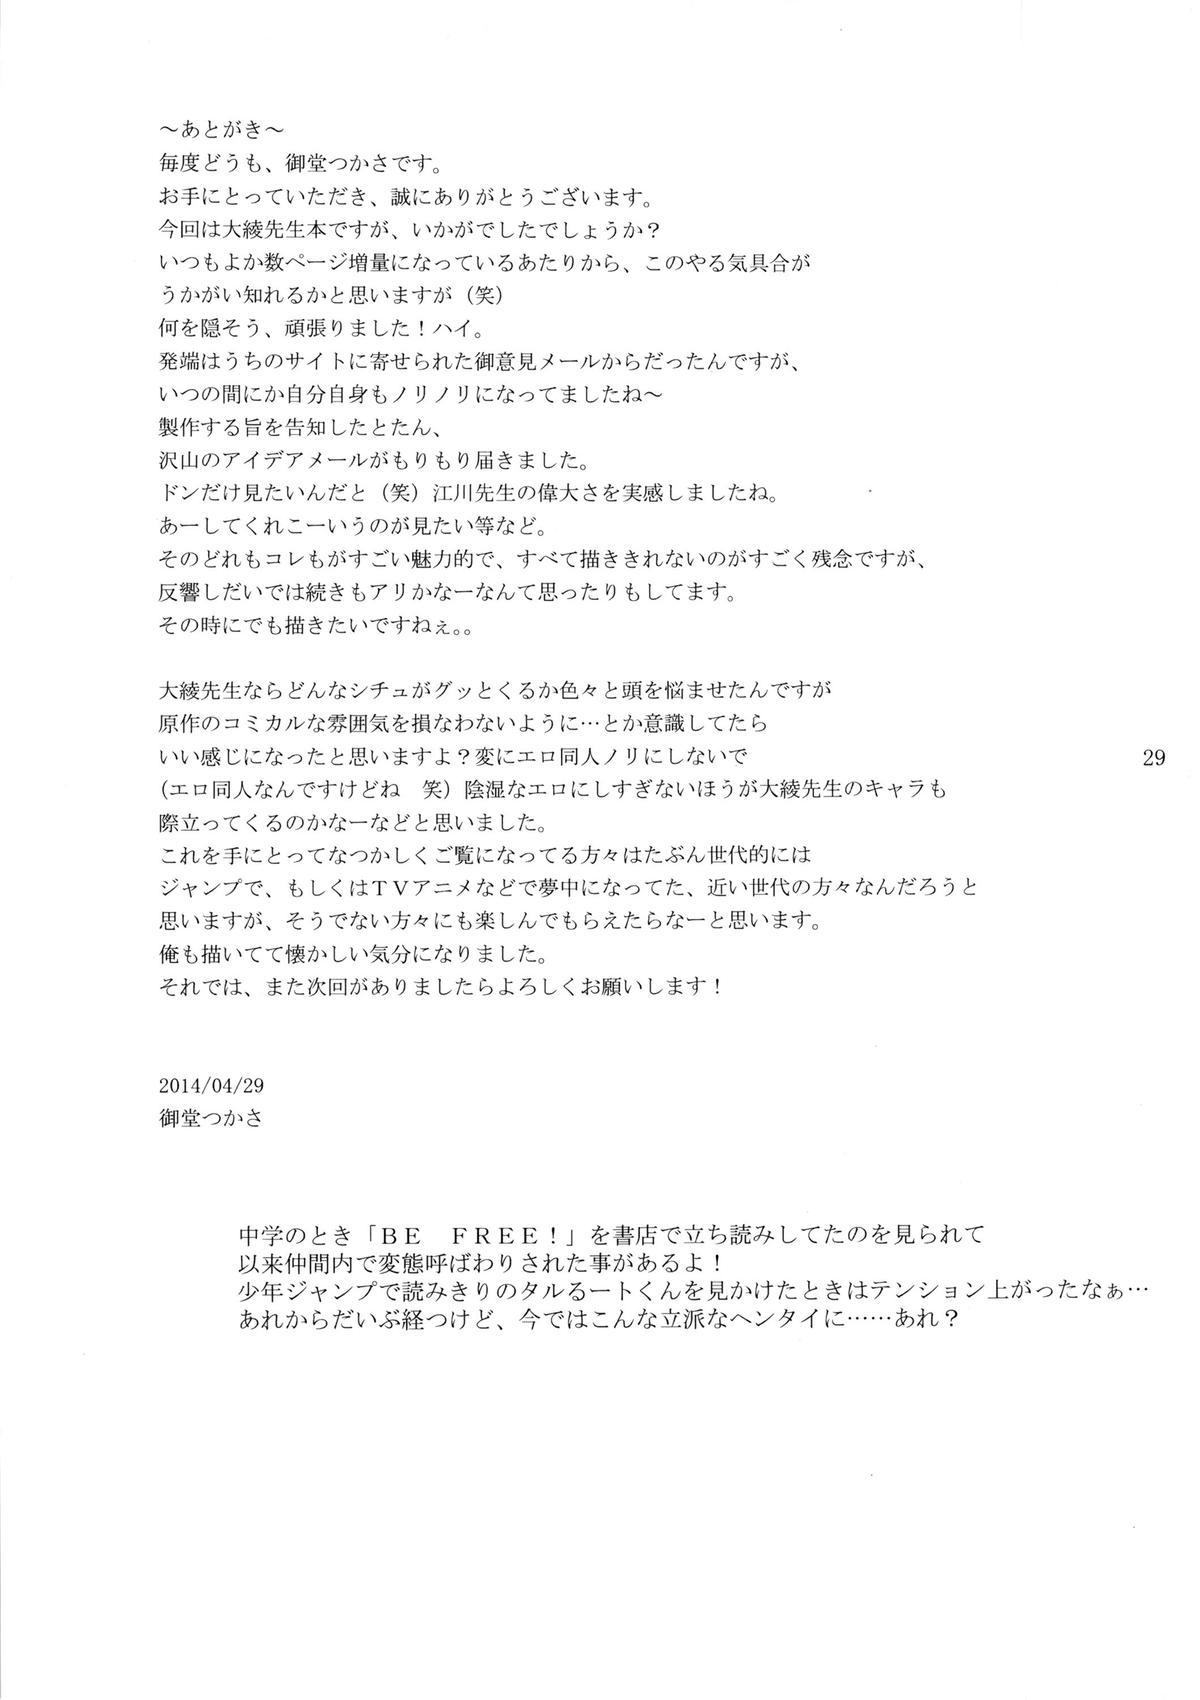 (COMIC1☆8) [G-panda (Midoh Tsukasa)] Maji kayo!? Ooaya-sensei   I Can't Believe It! Ooaya-sensei (Magical Taruruuto-kun) [English] {doujin-moe.us} 27